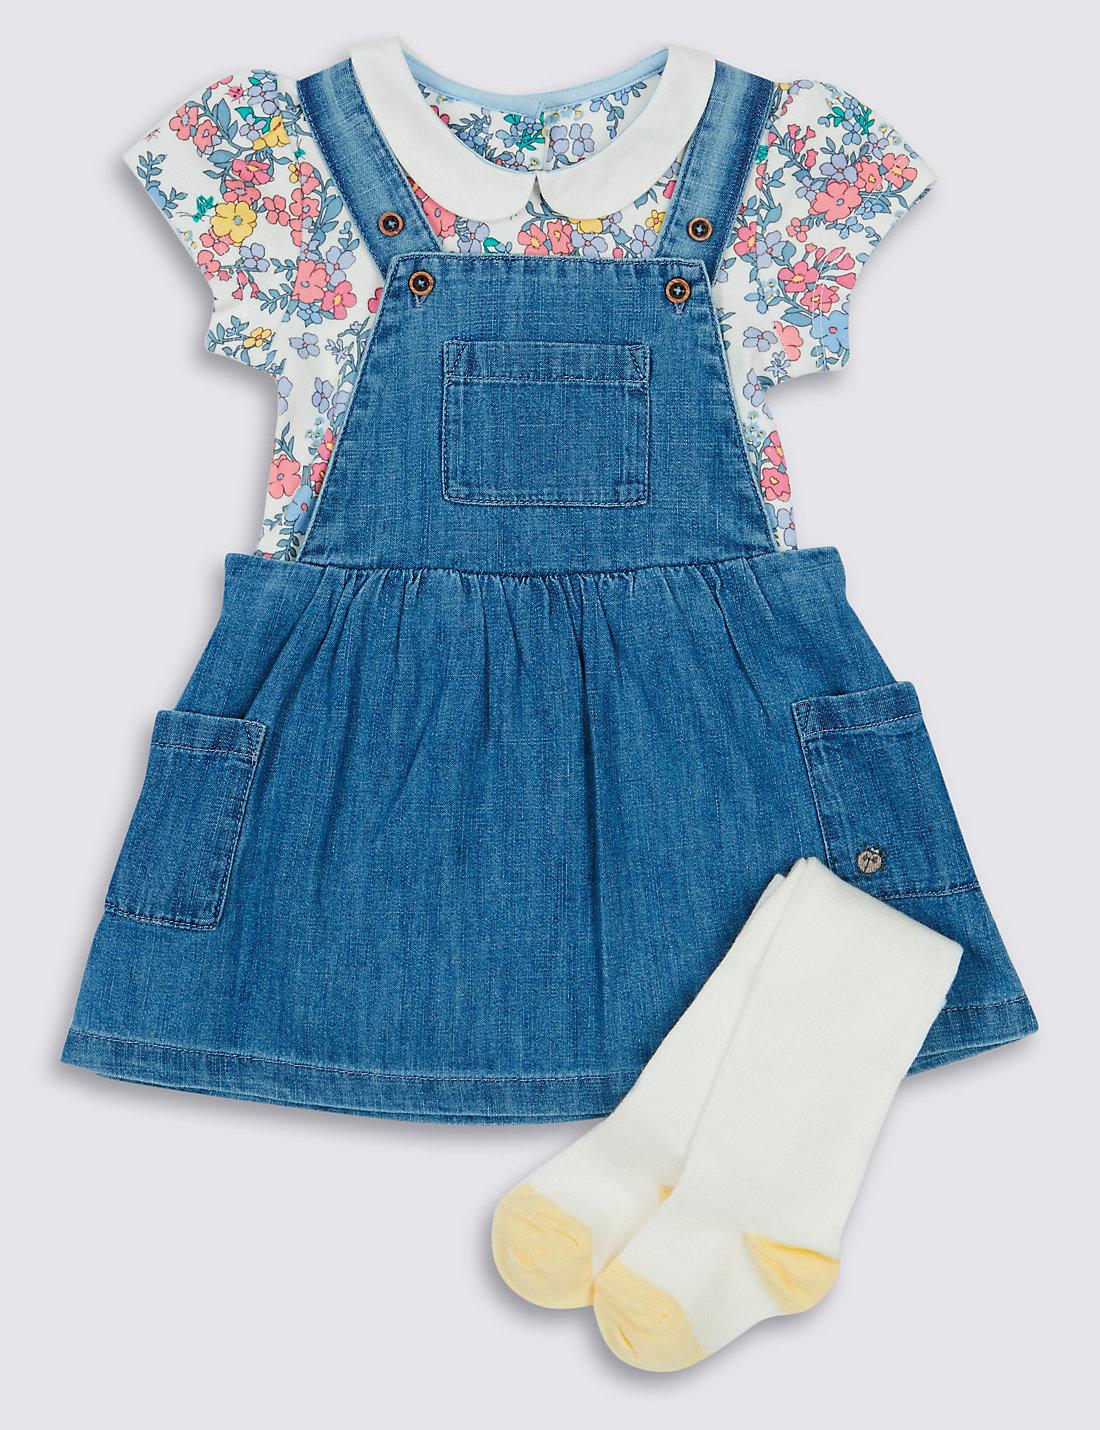 3 Piece Cotton Rich Denim Pinafore, Bodysuit & Tights Outfits